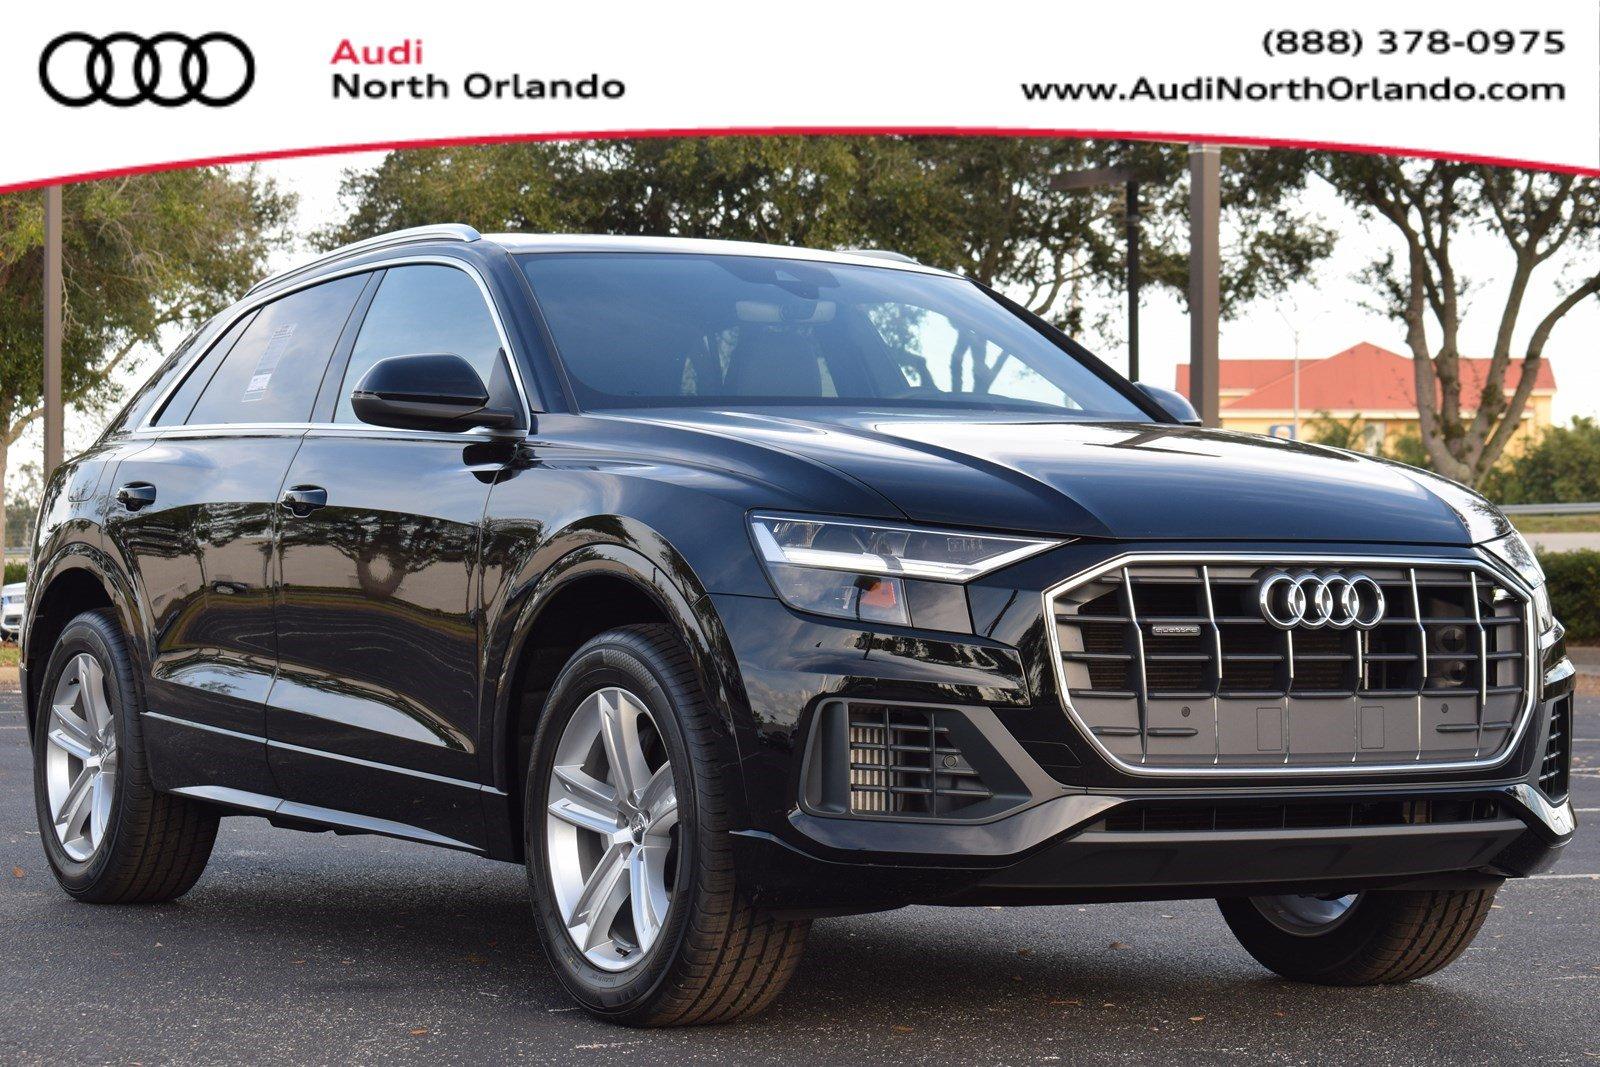 Featured new 2019 Audi Q8 3.0T Premium SUV for sale in Sanford, FL, near Orlando, FL.